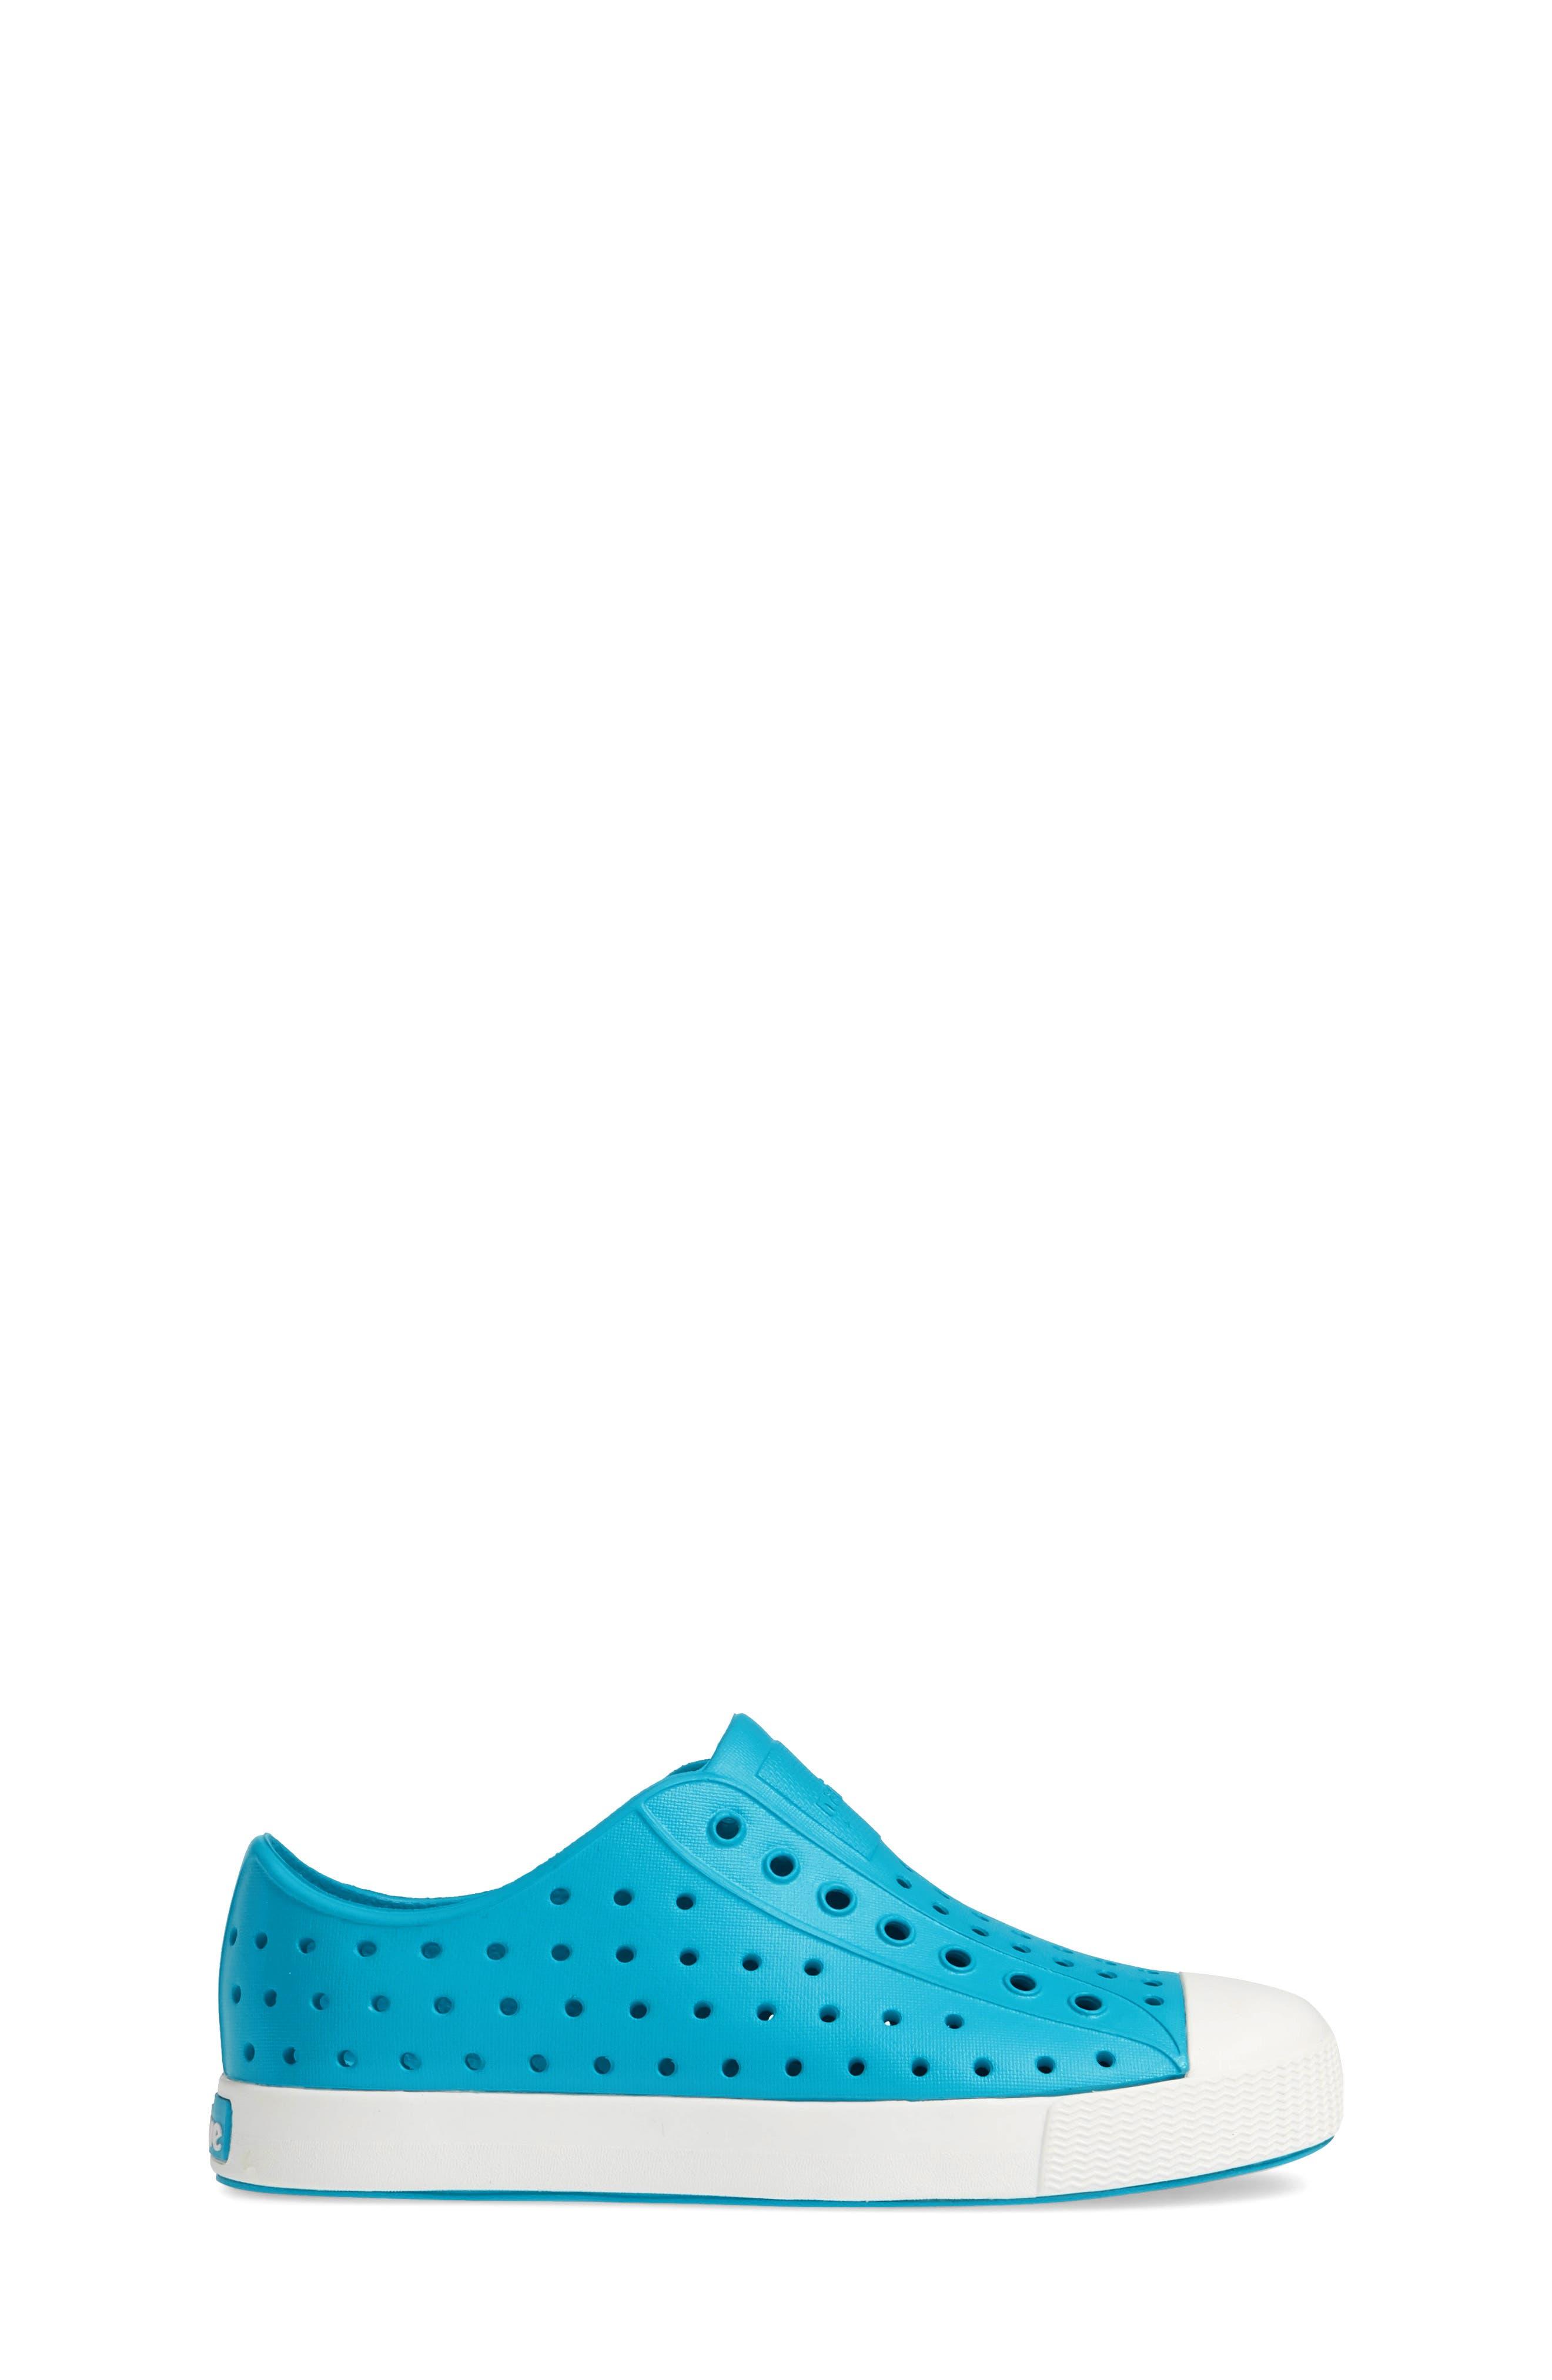 'Jefferson' Water Friendly Slip-On Sneaker,                             Alternate thumbnail 155, color,